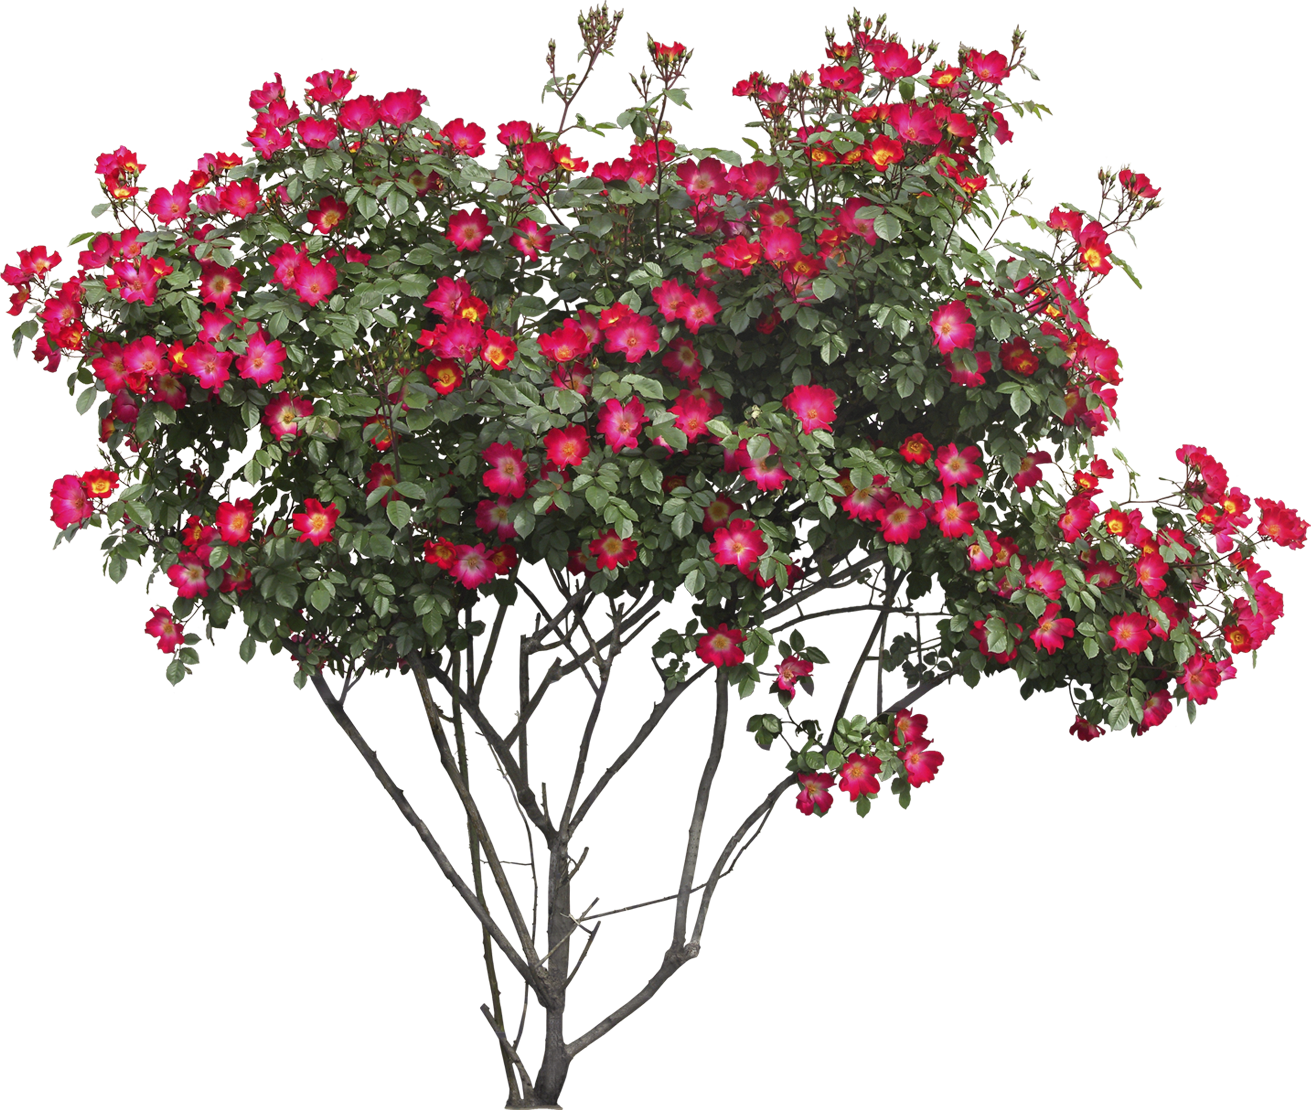 svg transparent stock Bushes png images free. Bush clipart transparent flower.